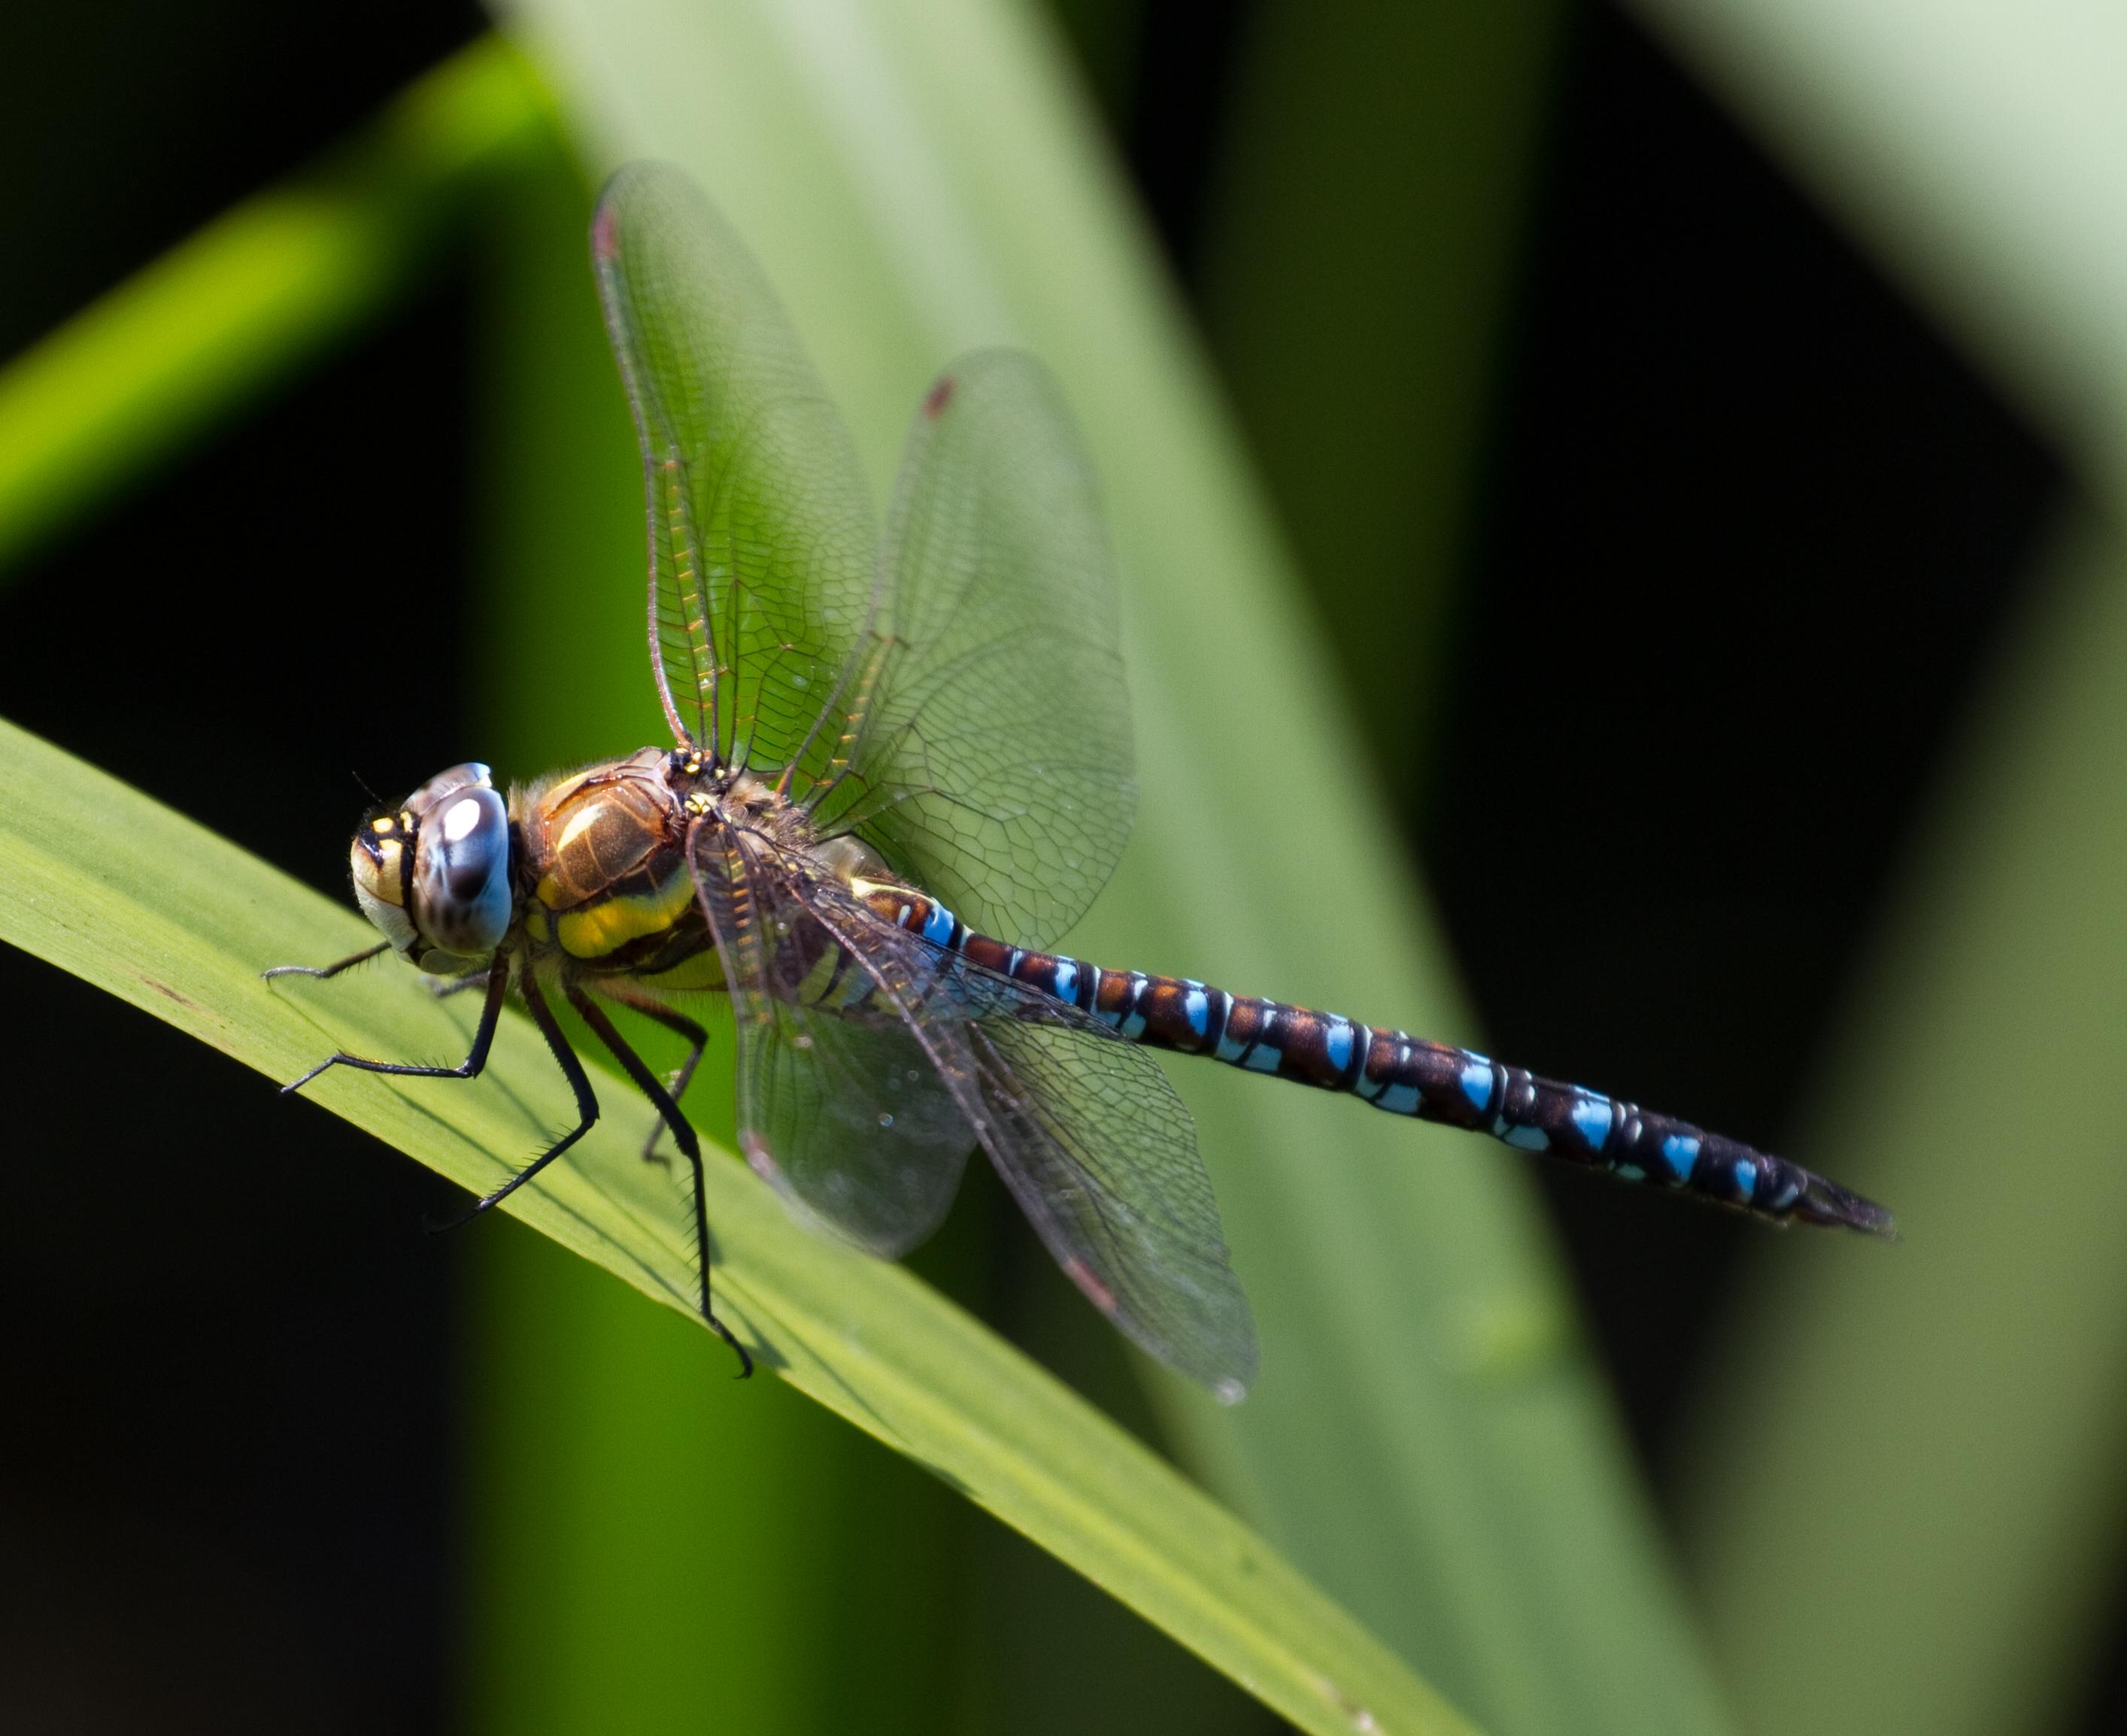 filecommon hawker dragonfly 9 6083392044jpg